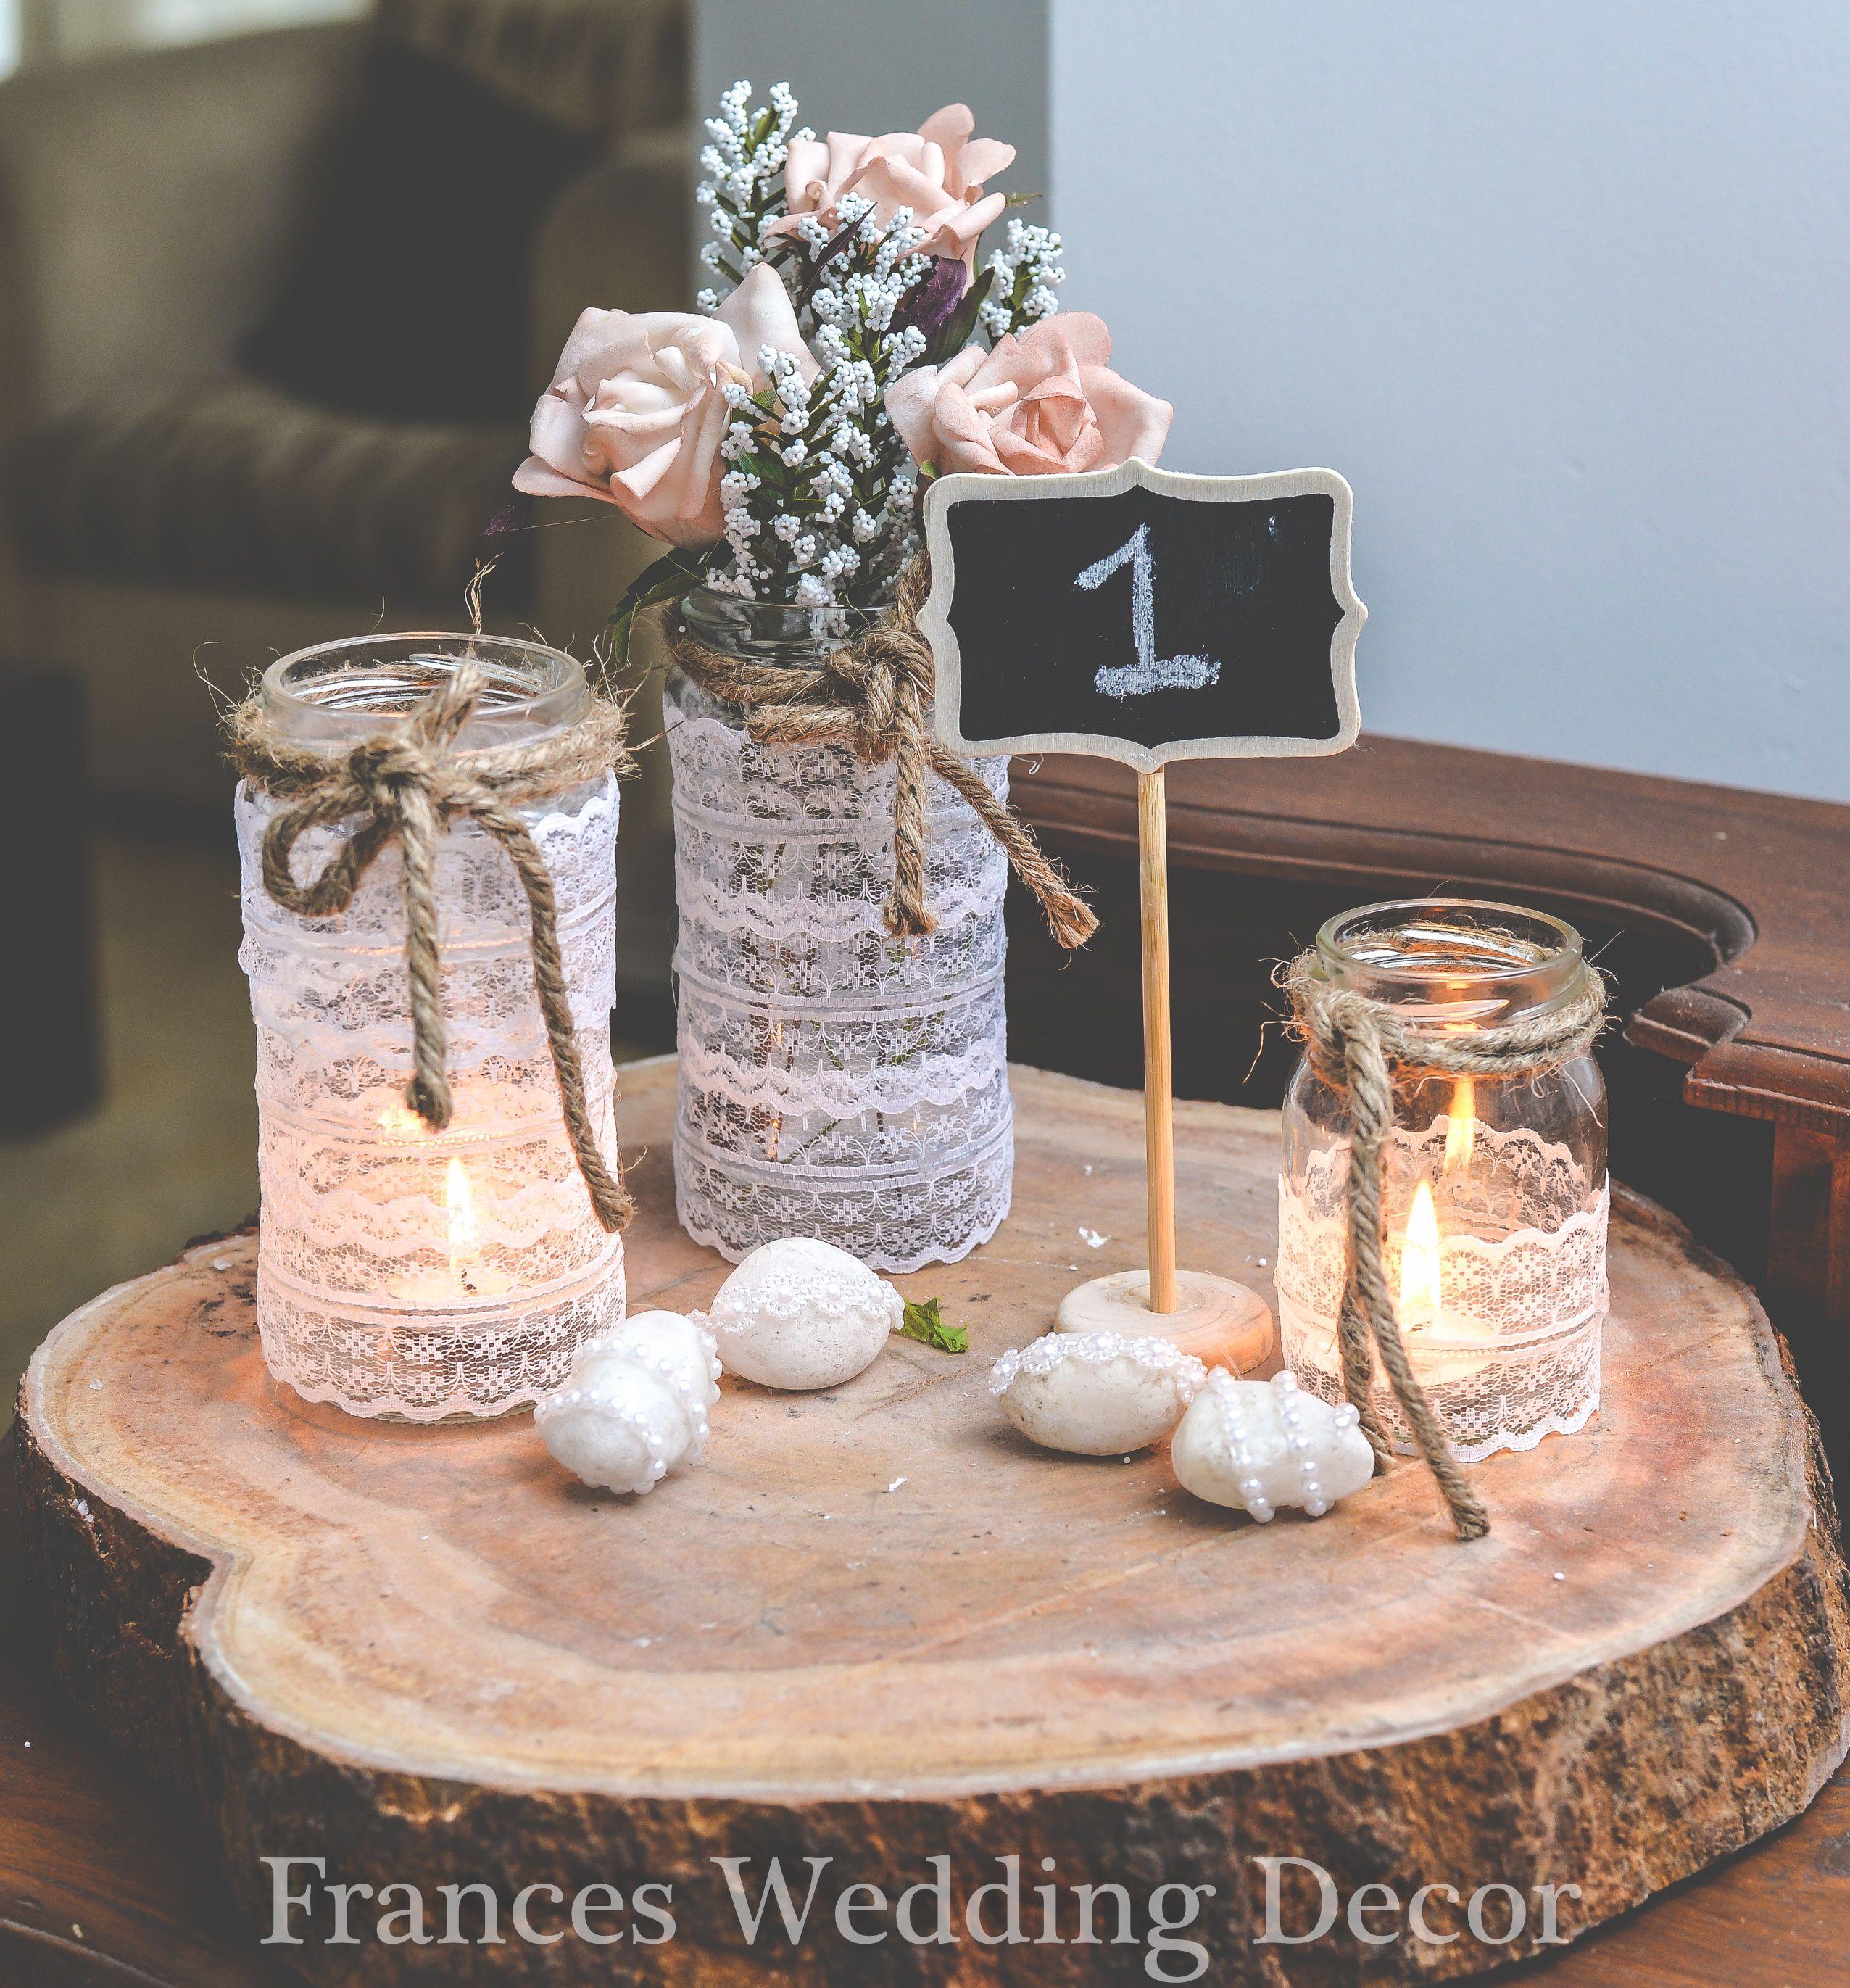 Srilankan wedding - frances wedding decor - weddings in Sri Lanka ... for Sri Lankan Wedding Table Decorations  575lpg